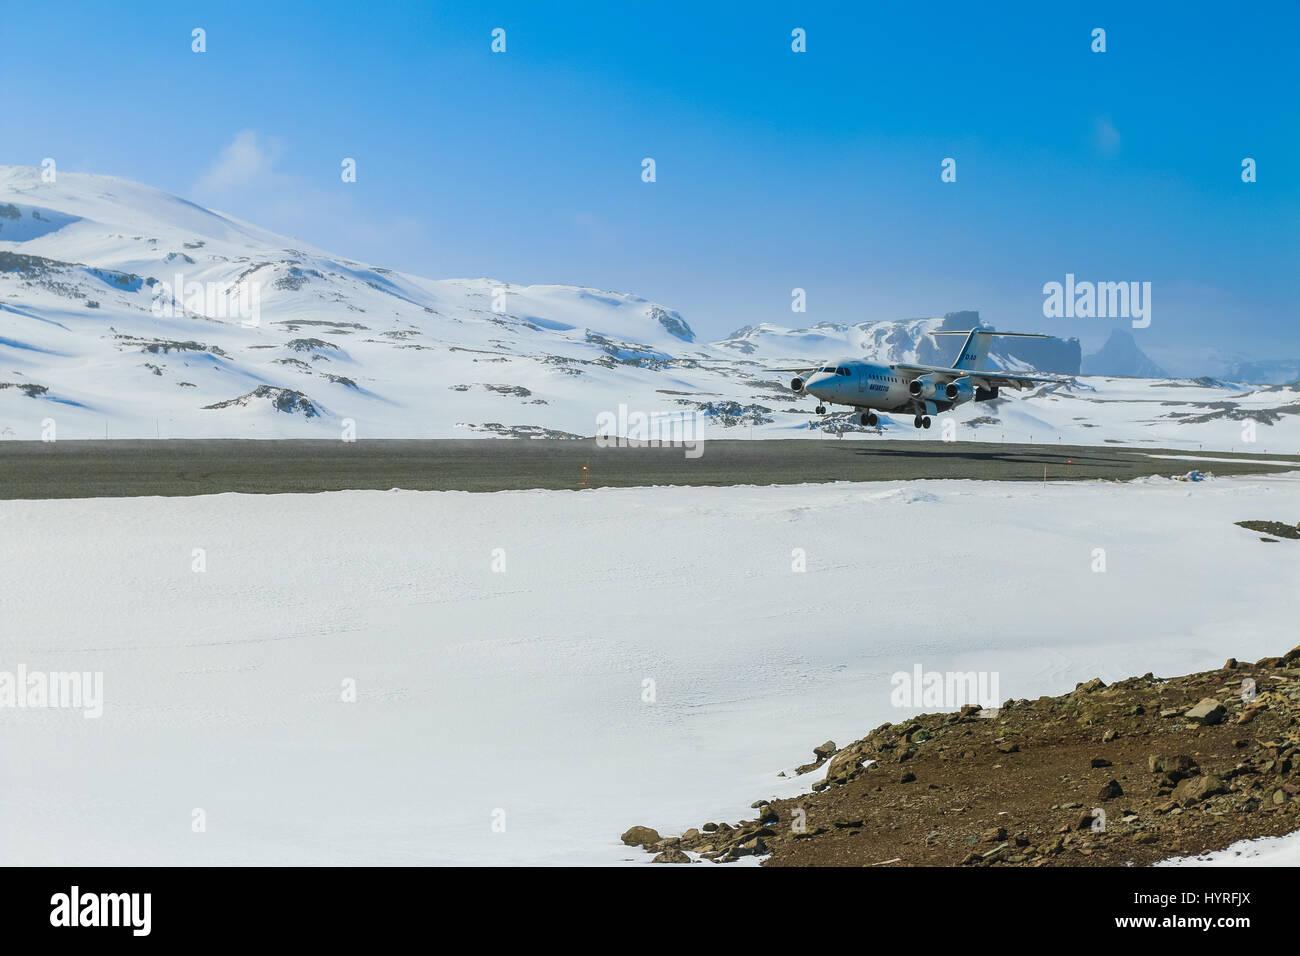 Regional airliner British Aerospace BAe 146 landing at Teniente R. Marsh Airport, King George Island, Antarctica Stock Photo